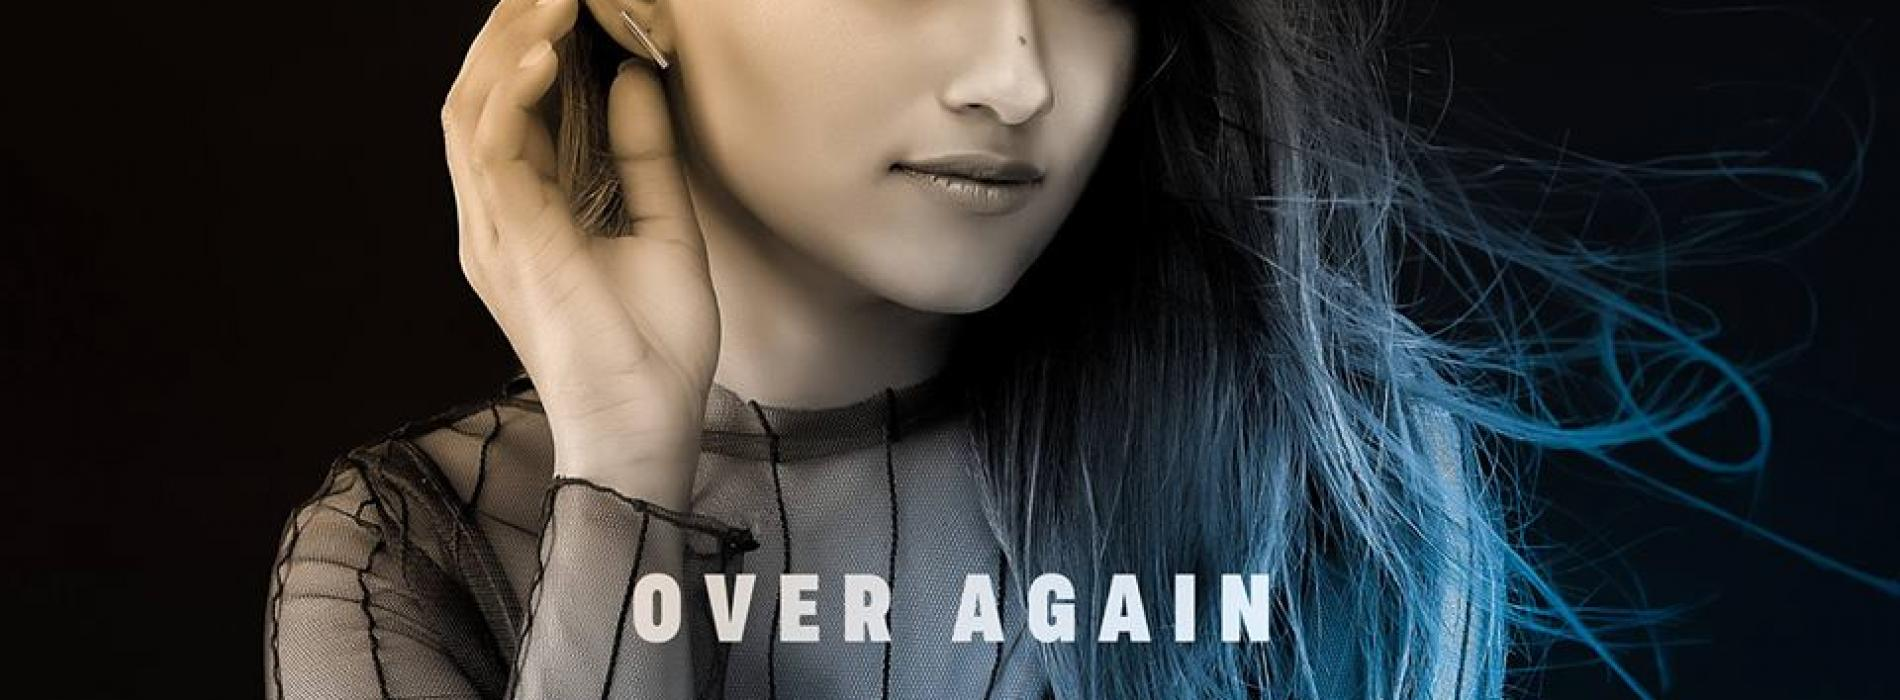 Saasha Will Be Releasing Her Debut Music Soon.